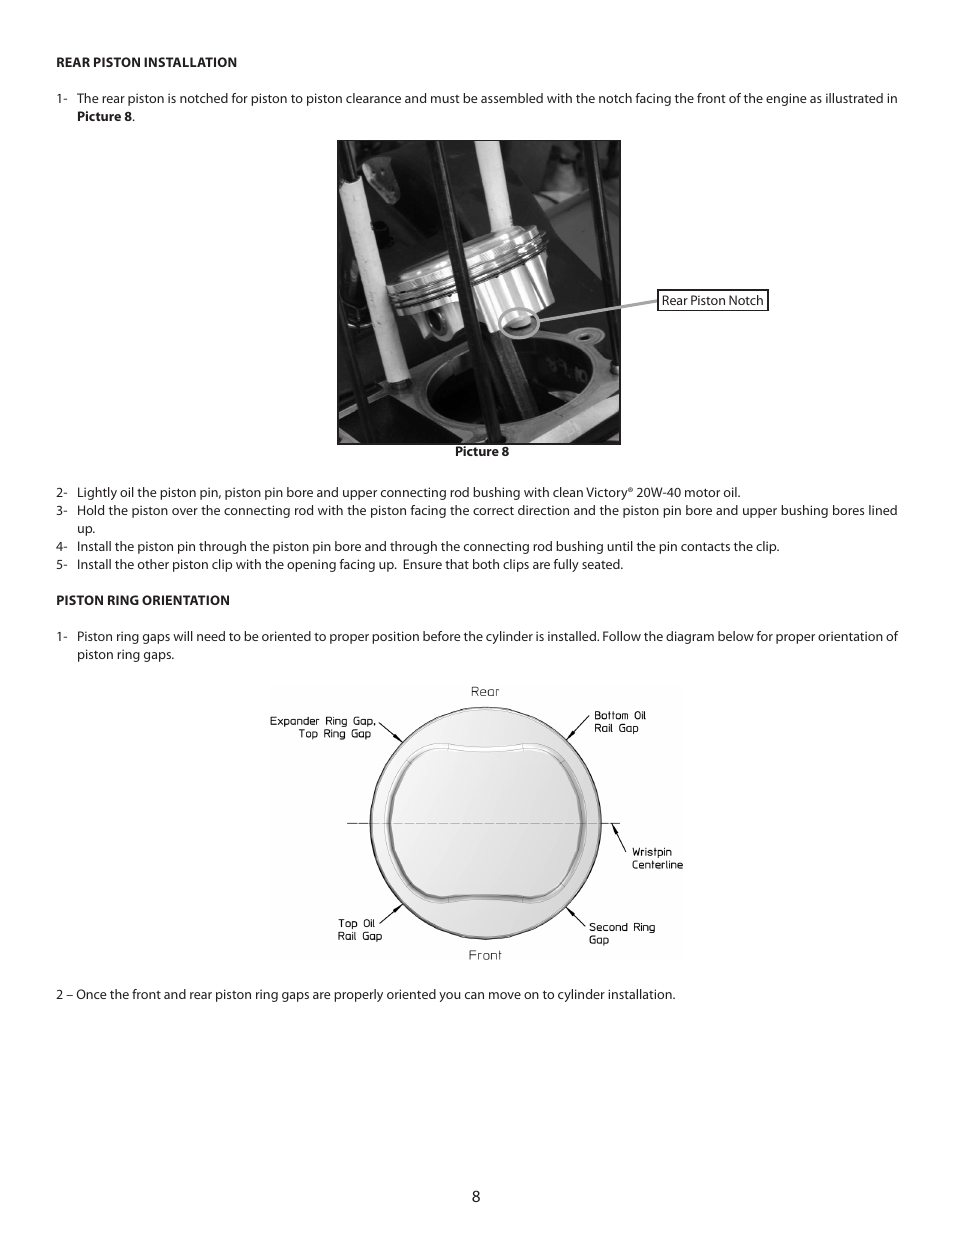 medium resolution of 2 cycle piston install diagram wiring diagram used 2 cycle piston install diagram